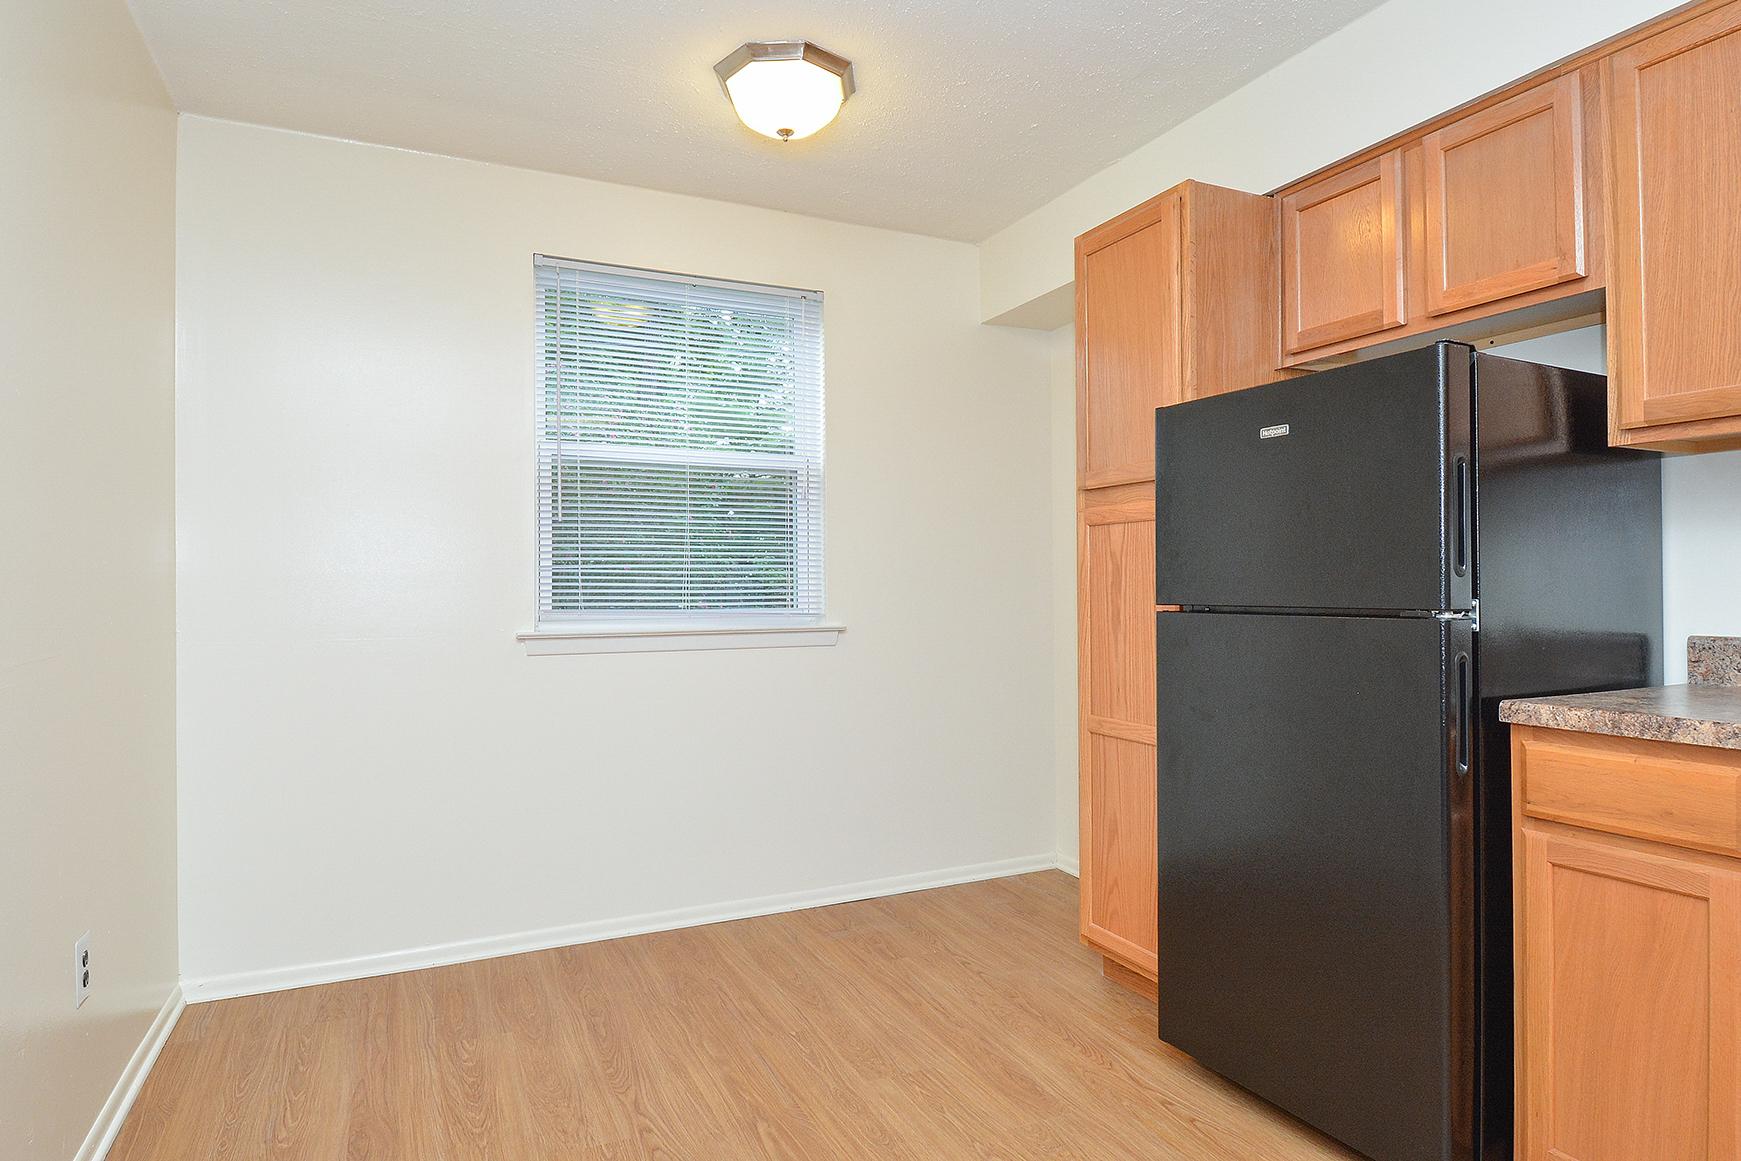 Elegant Kitchen | Apartments in Willow Grove, PA | Willow Run Apartments